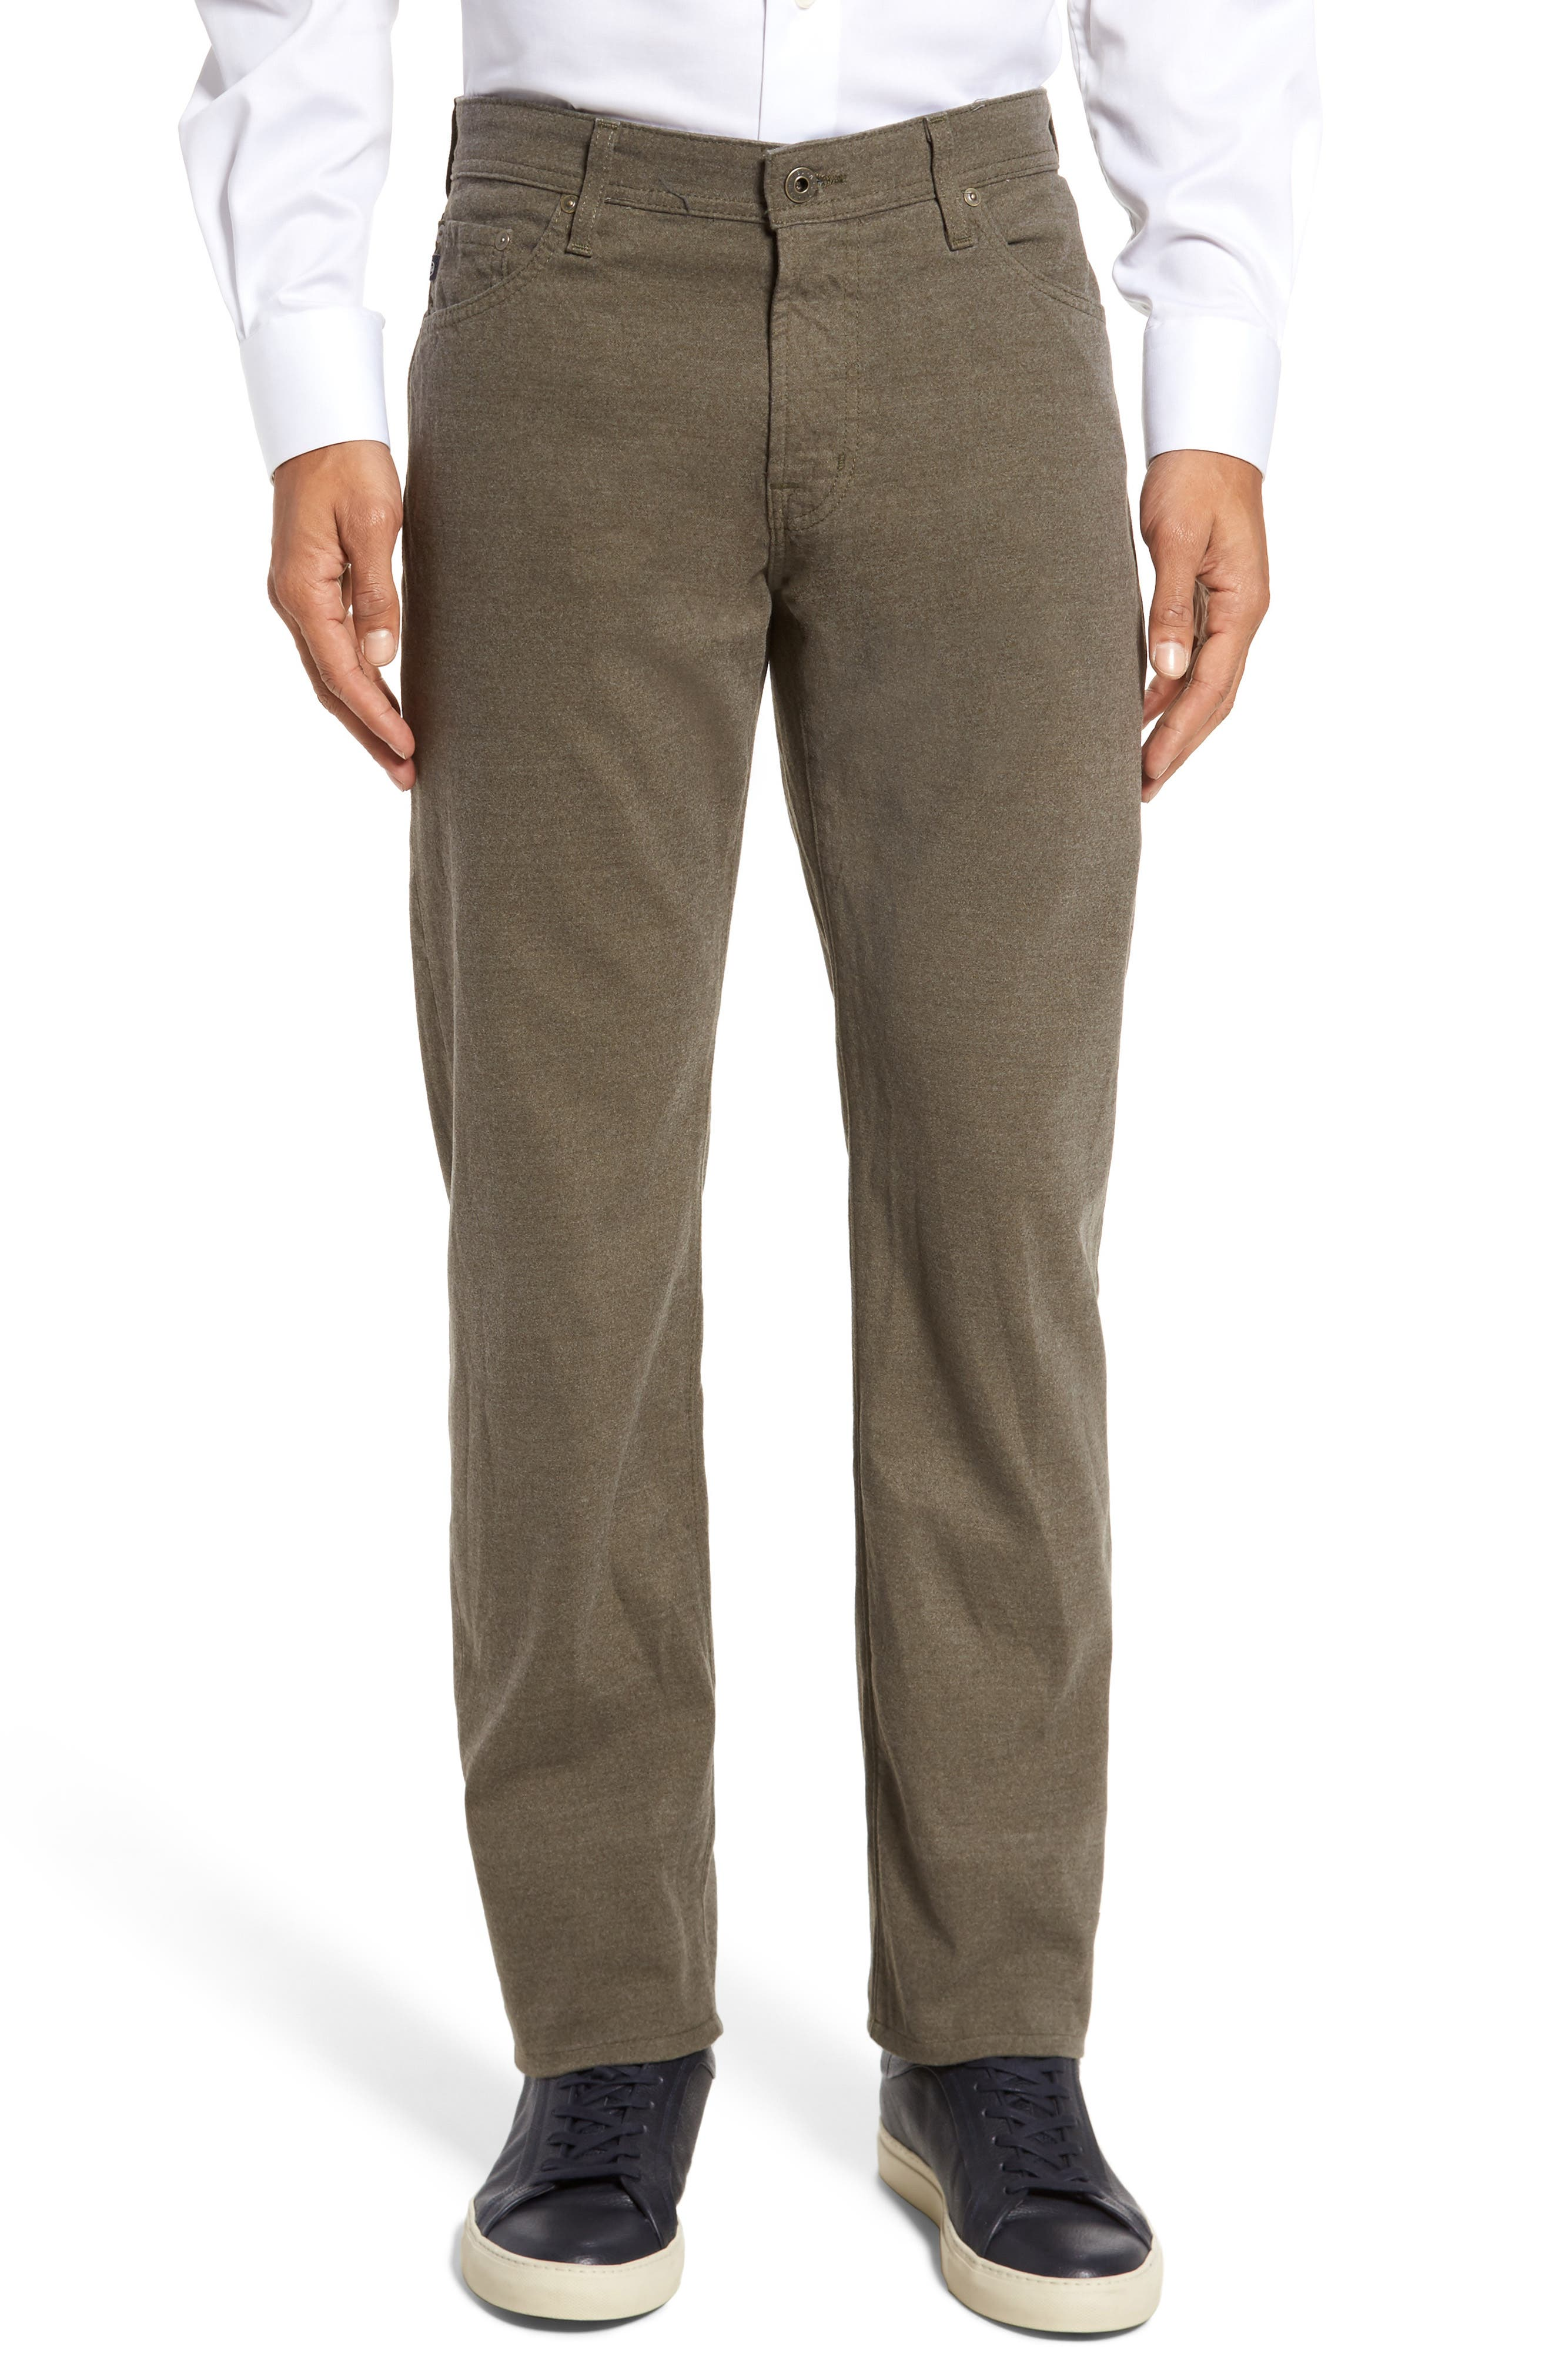 Graduate Tailored Five-Pocket Straight Leg Pants,                             Main thumbnail 1, color,                             CLIMBING IVY